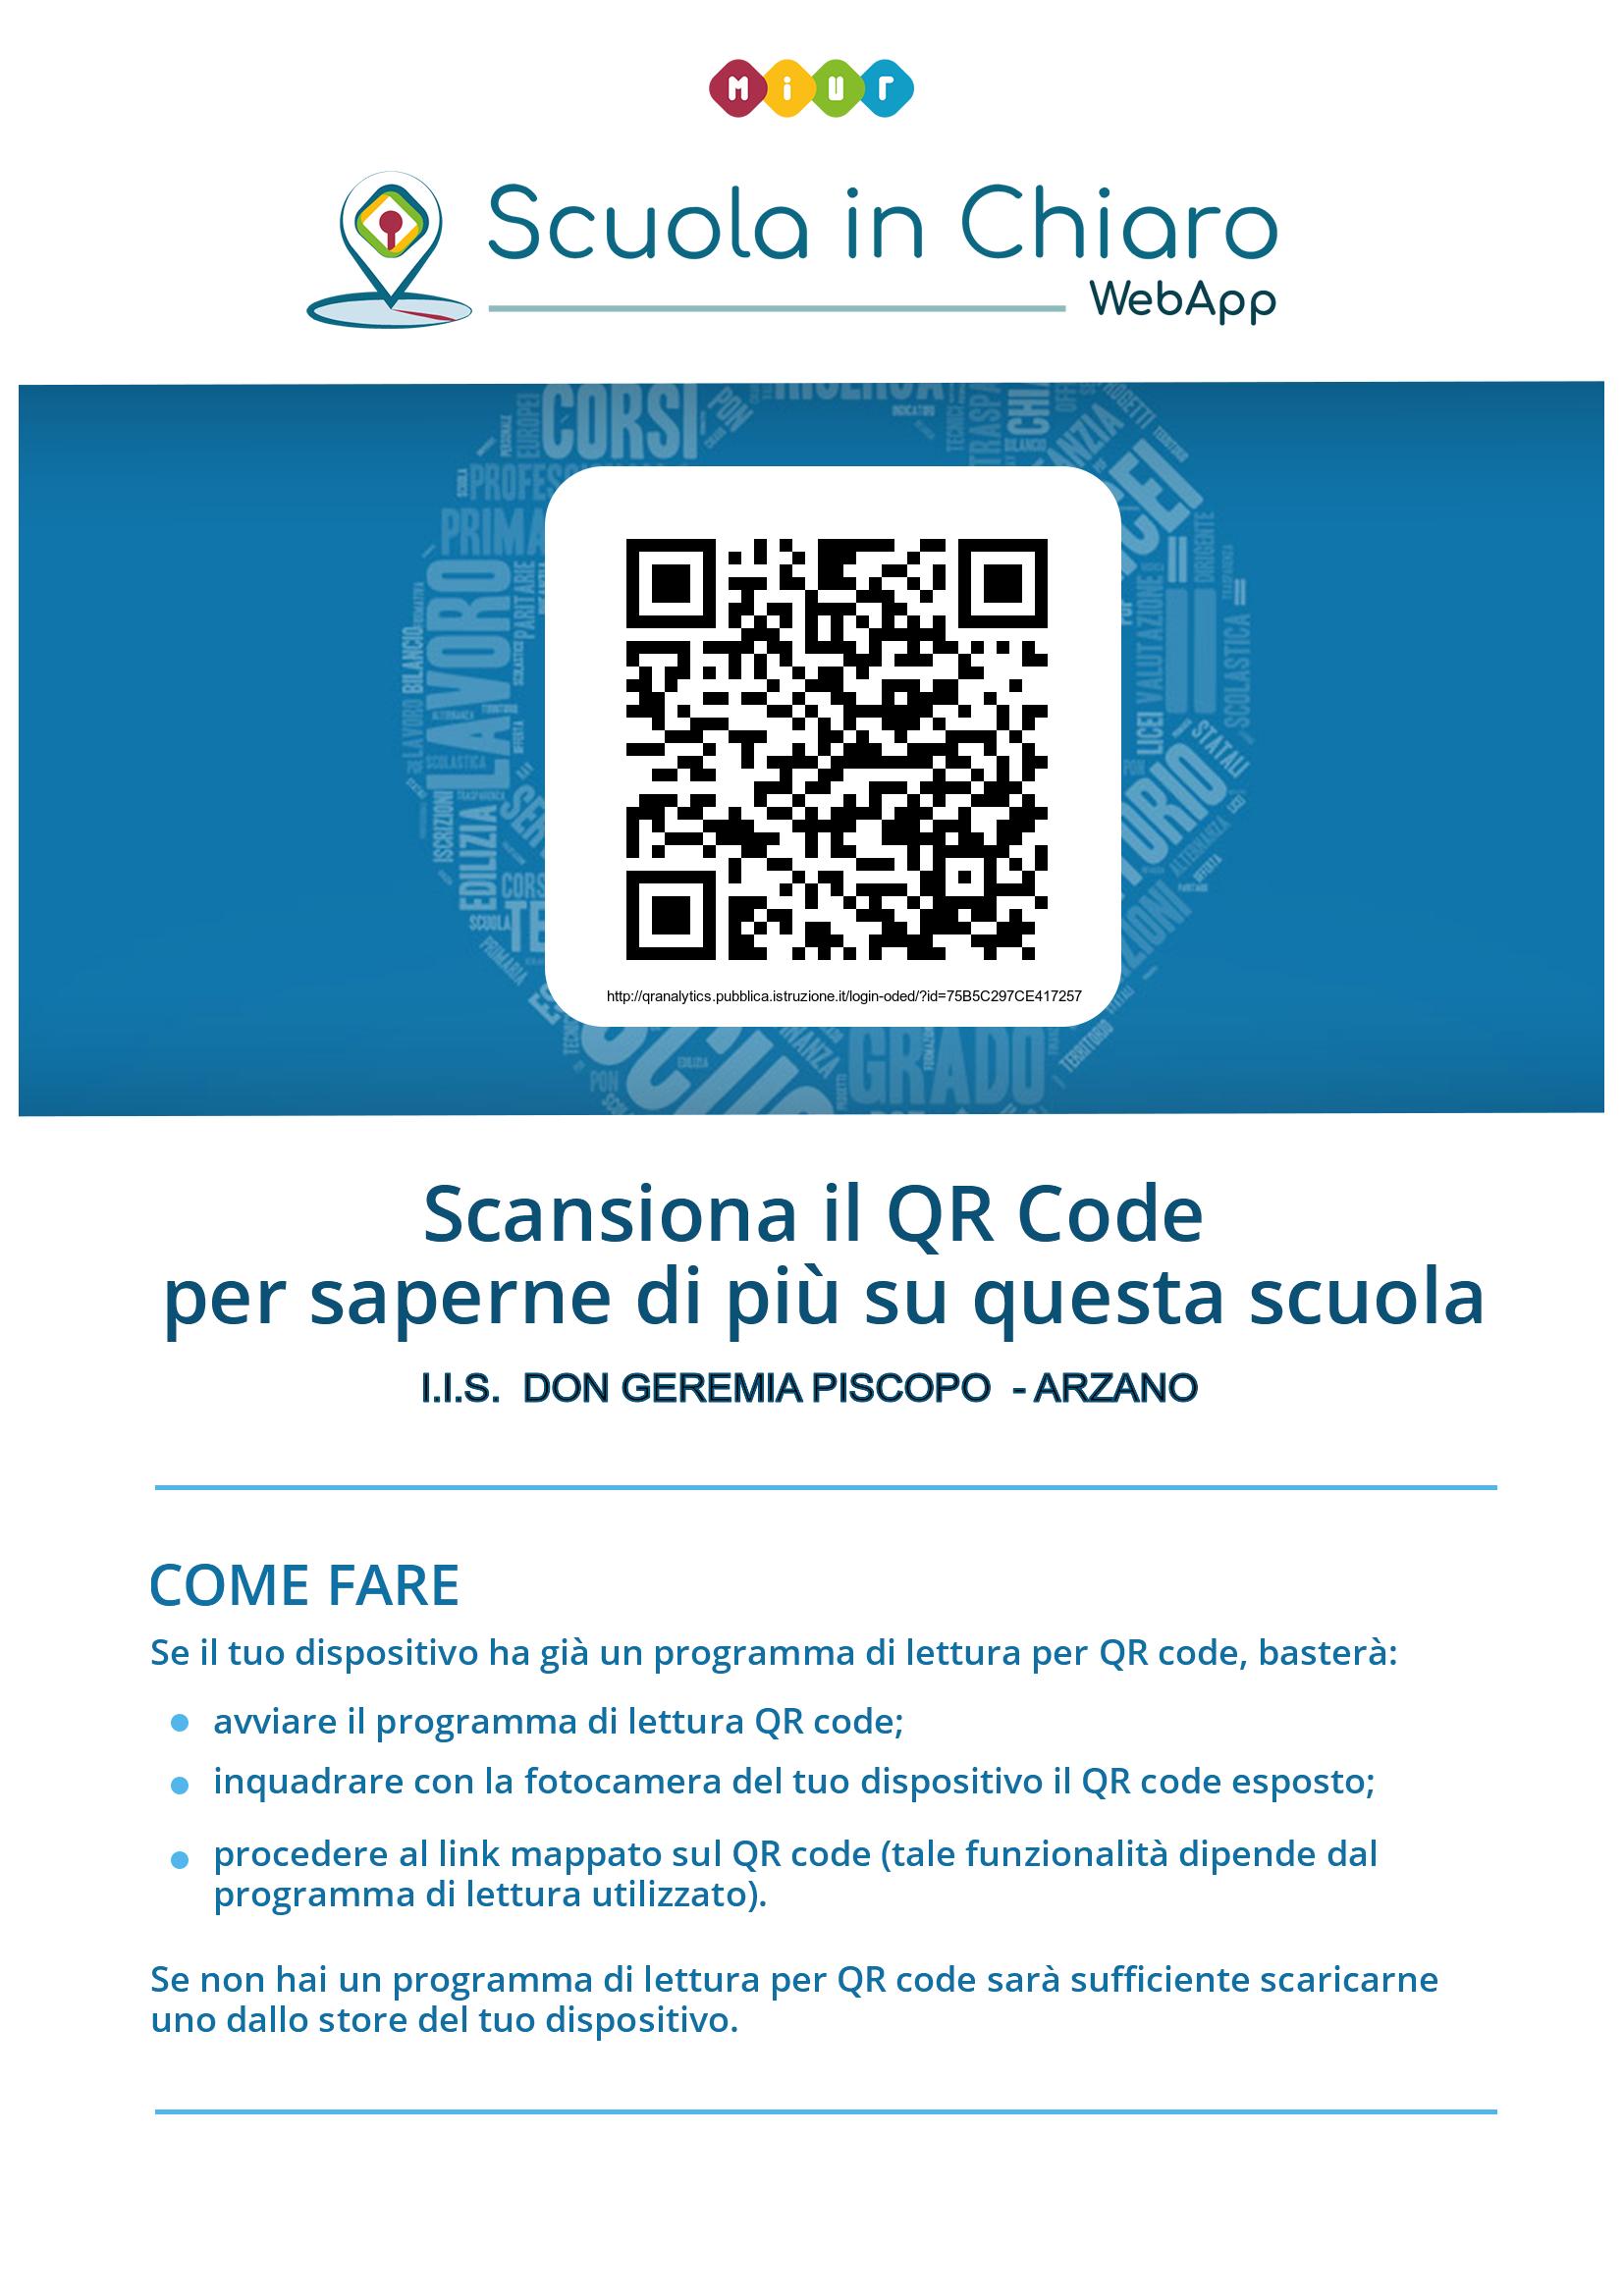 QR Code I.I.S. Don Geremia Piscopo